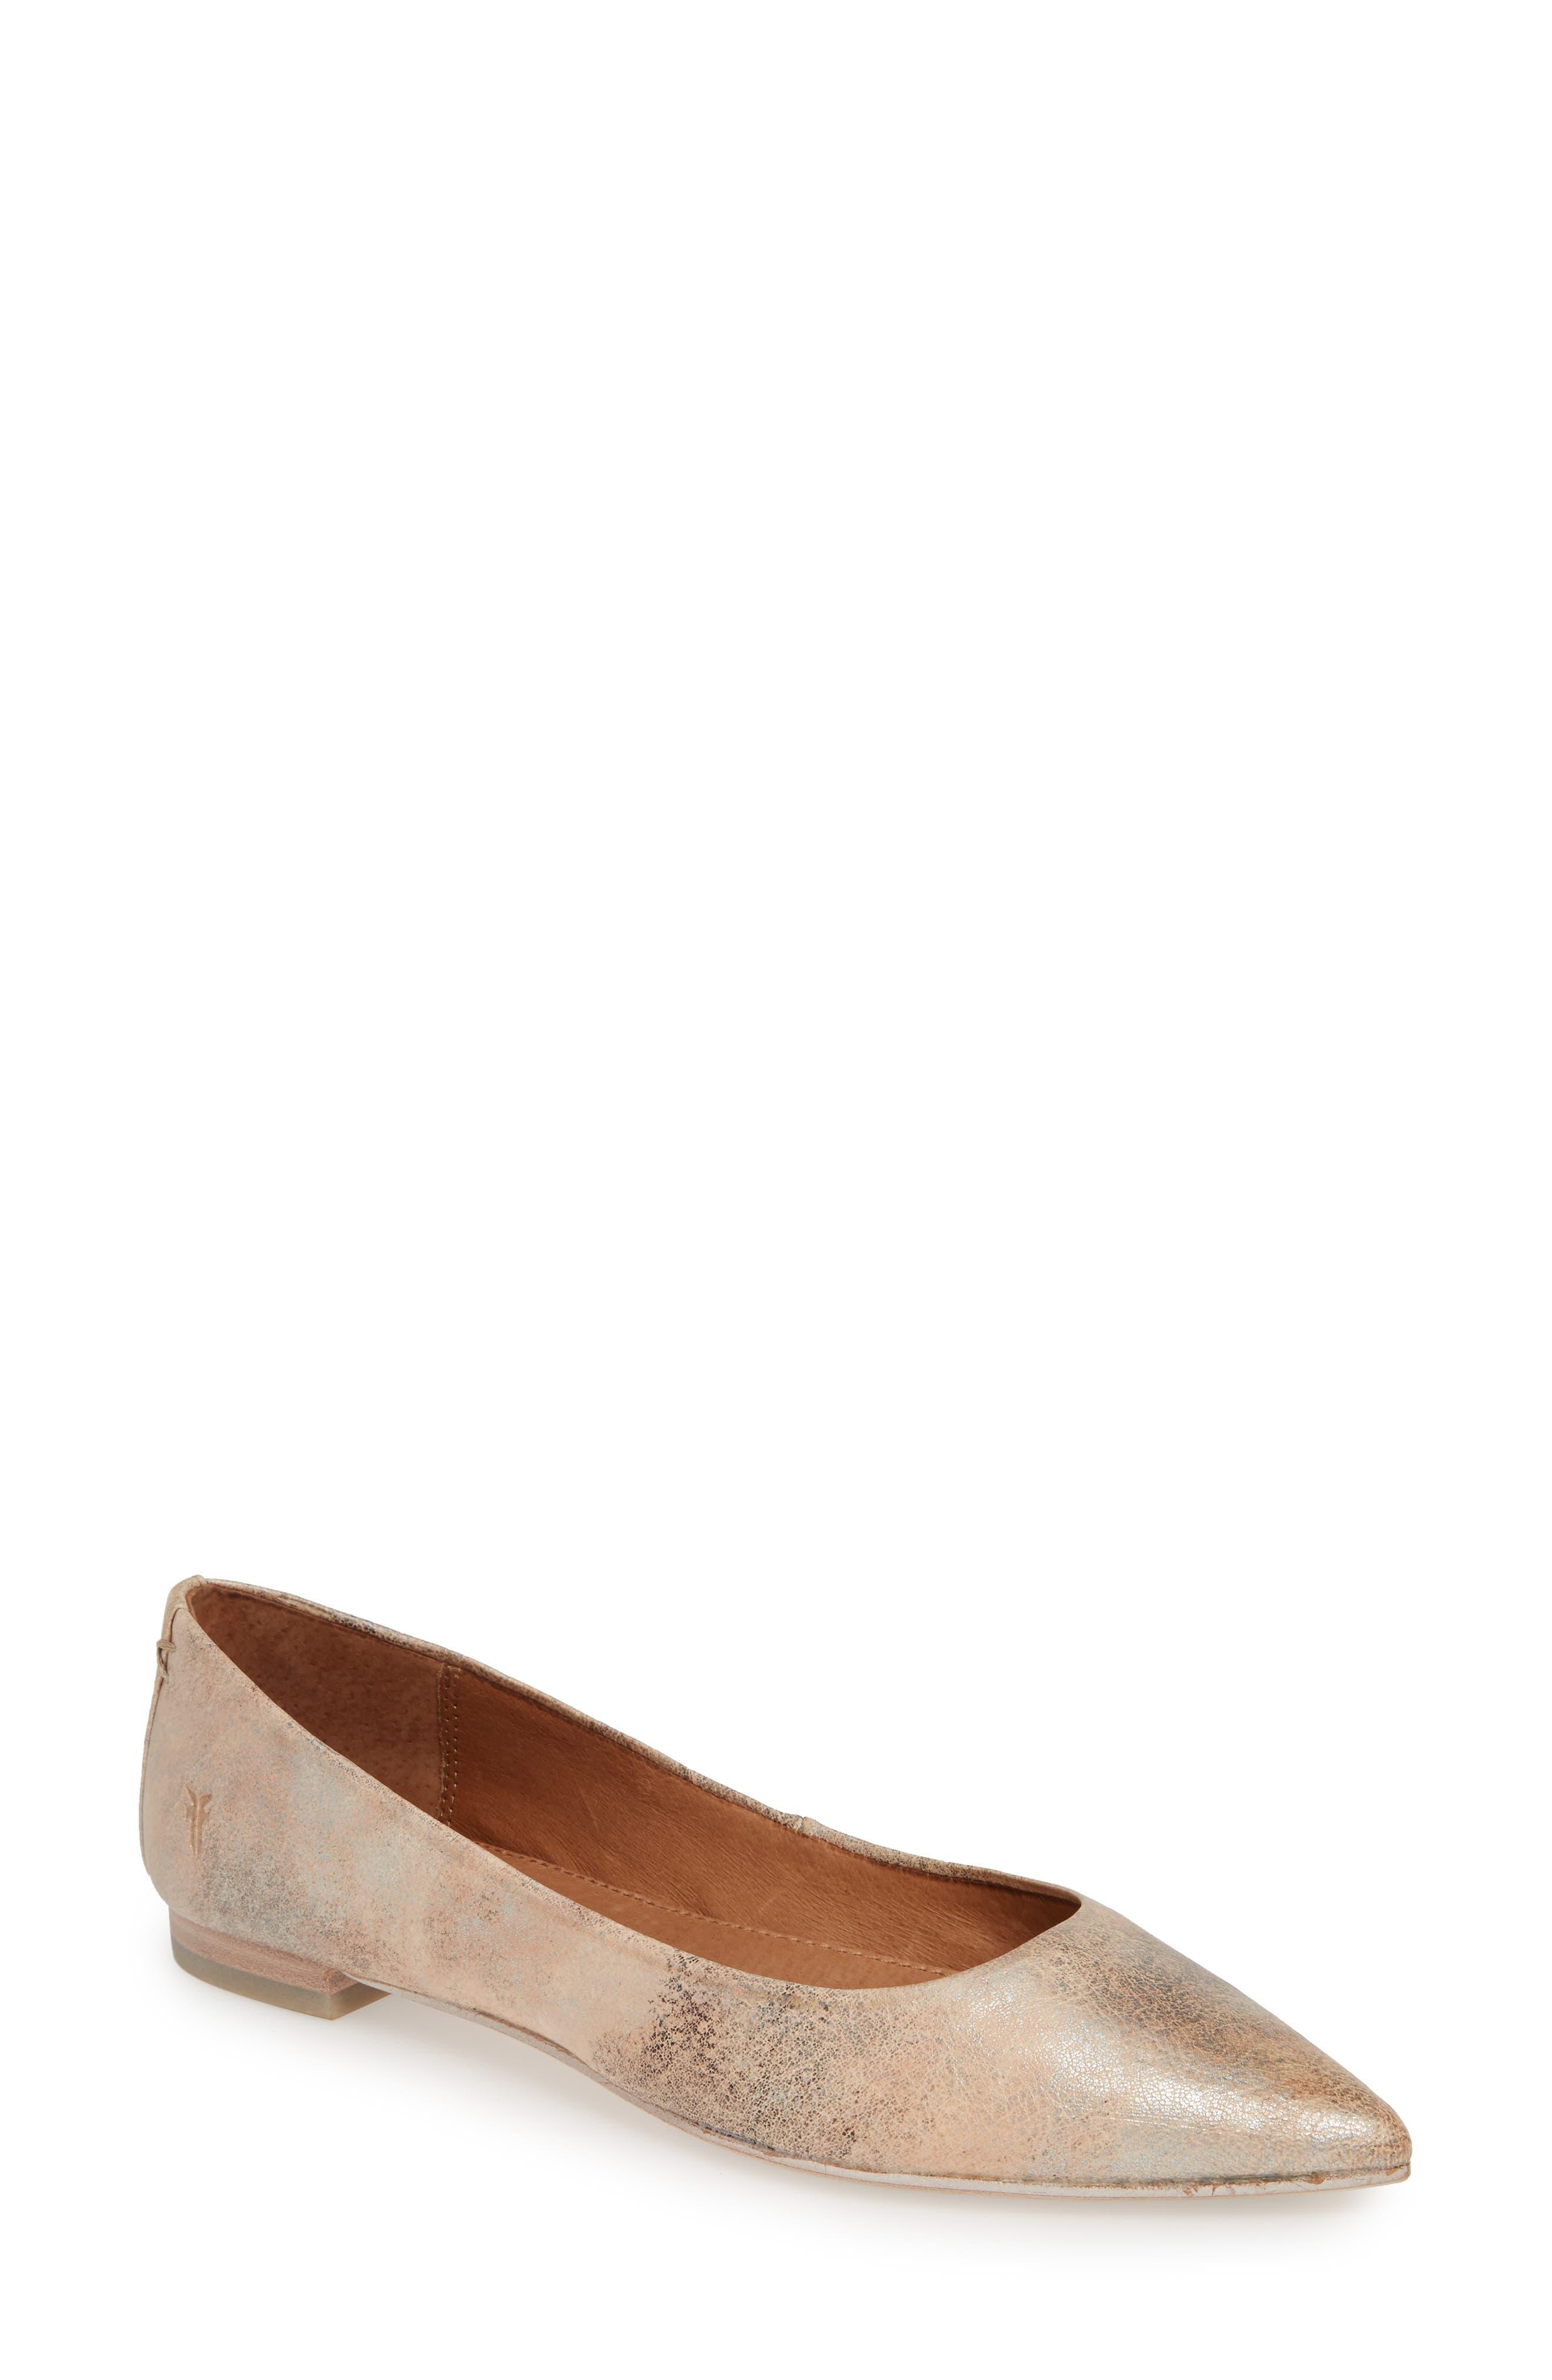 Frye Sienna Pointy Toe Ballet Flat, Metallic